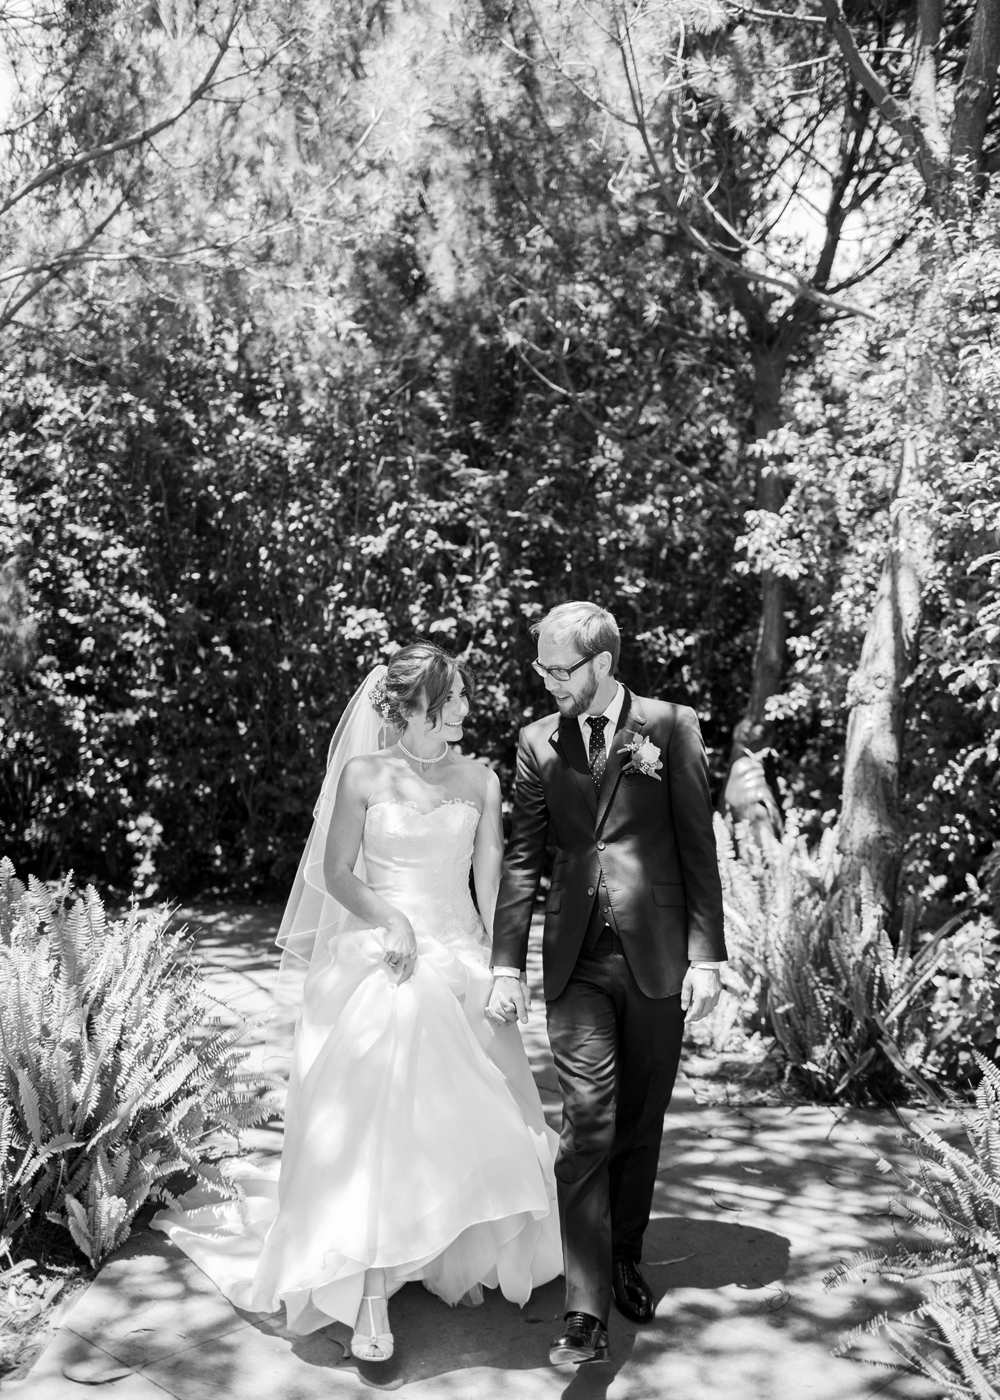 shakespeare-garden-potrero-hill-neighborhood-house-wedding-photography-lilouette-31.jpg